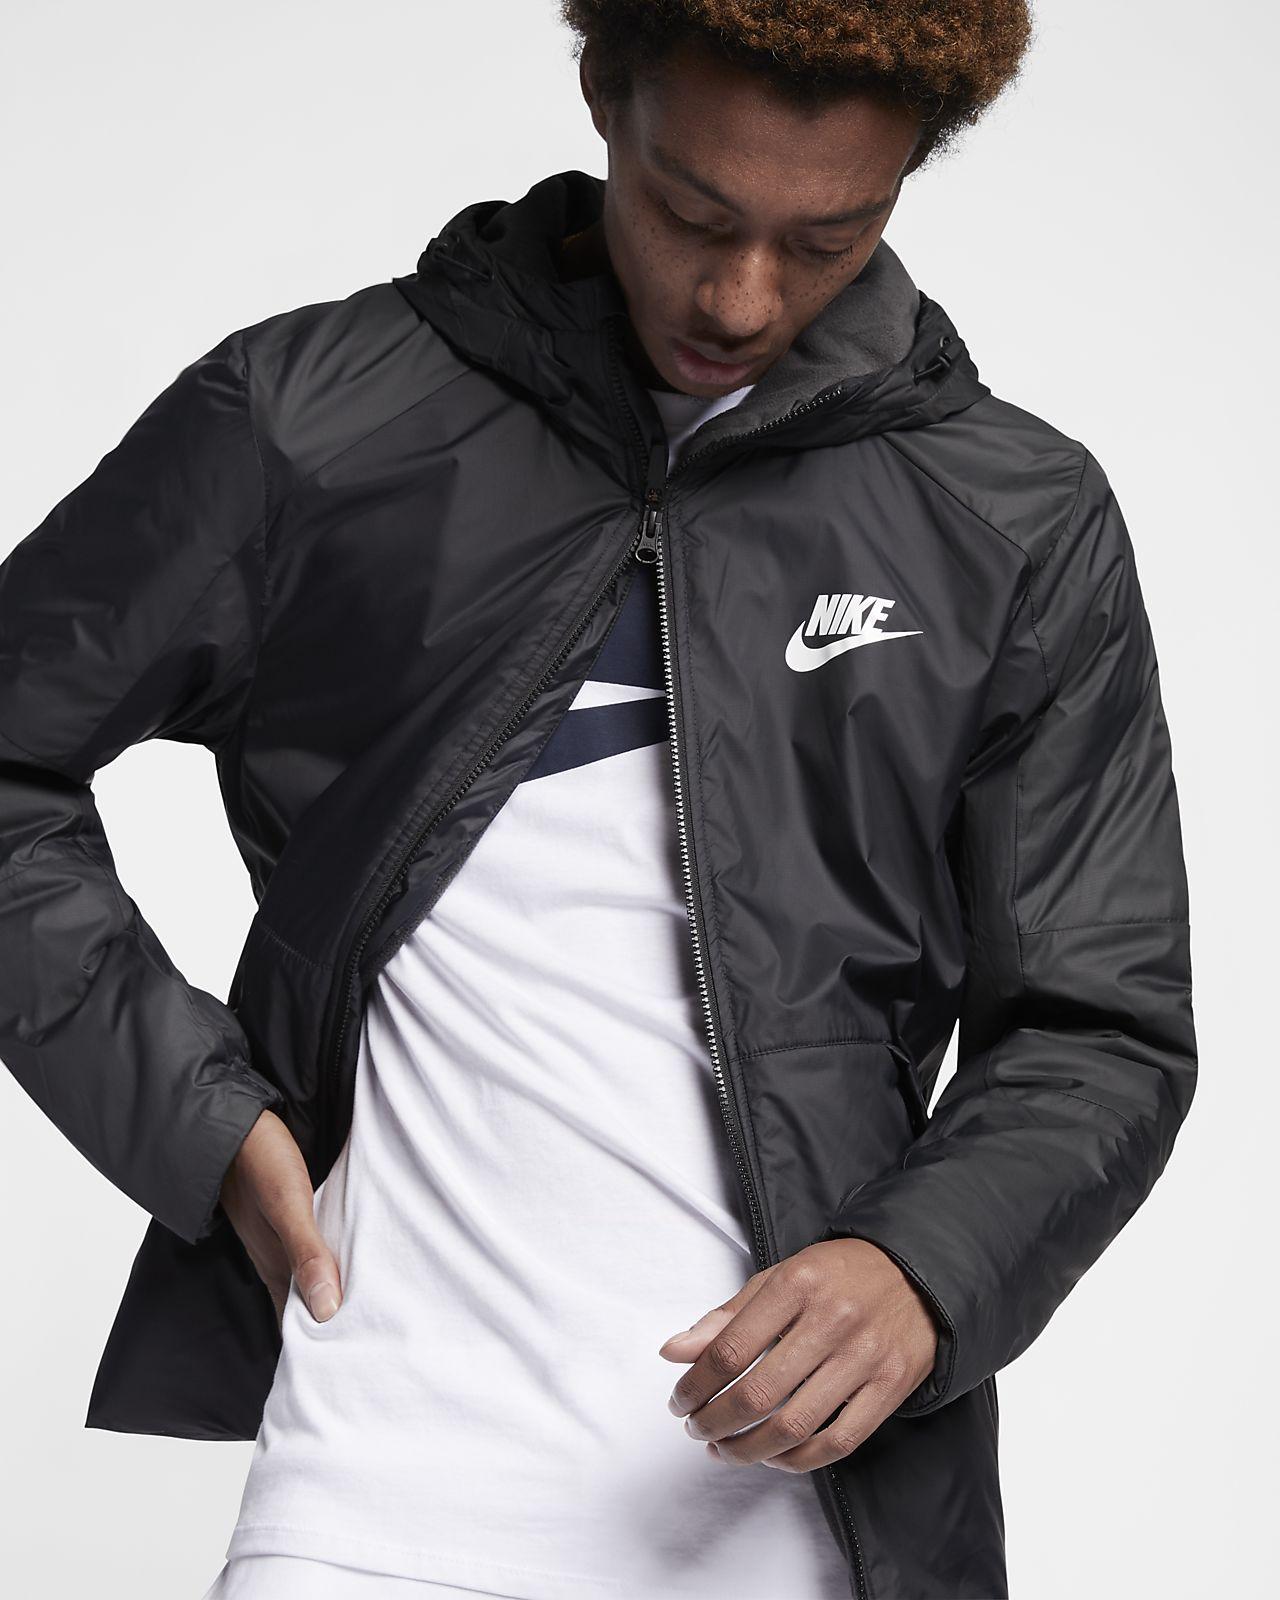 Мужская куртка из флиса с капюшоном Nike Sportswear Synthetic Fill